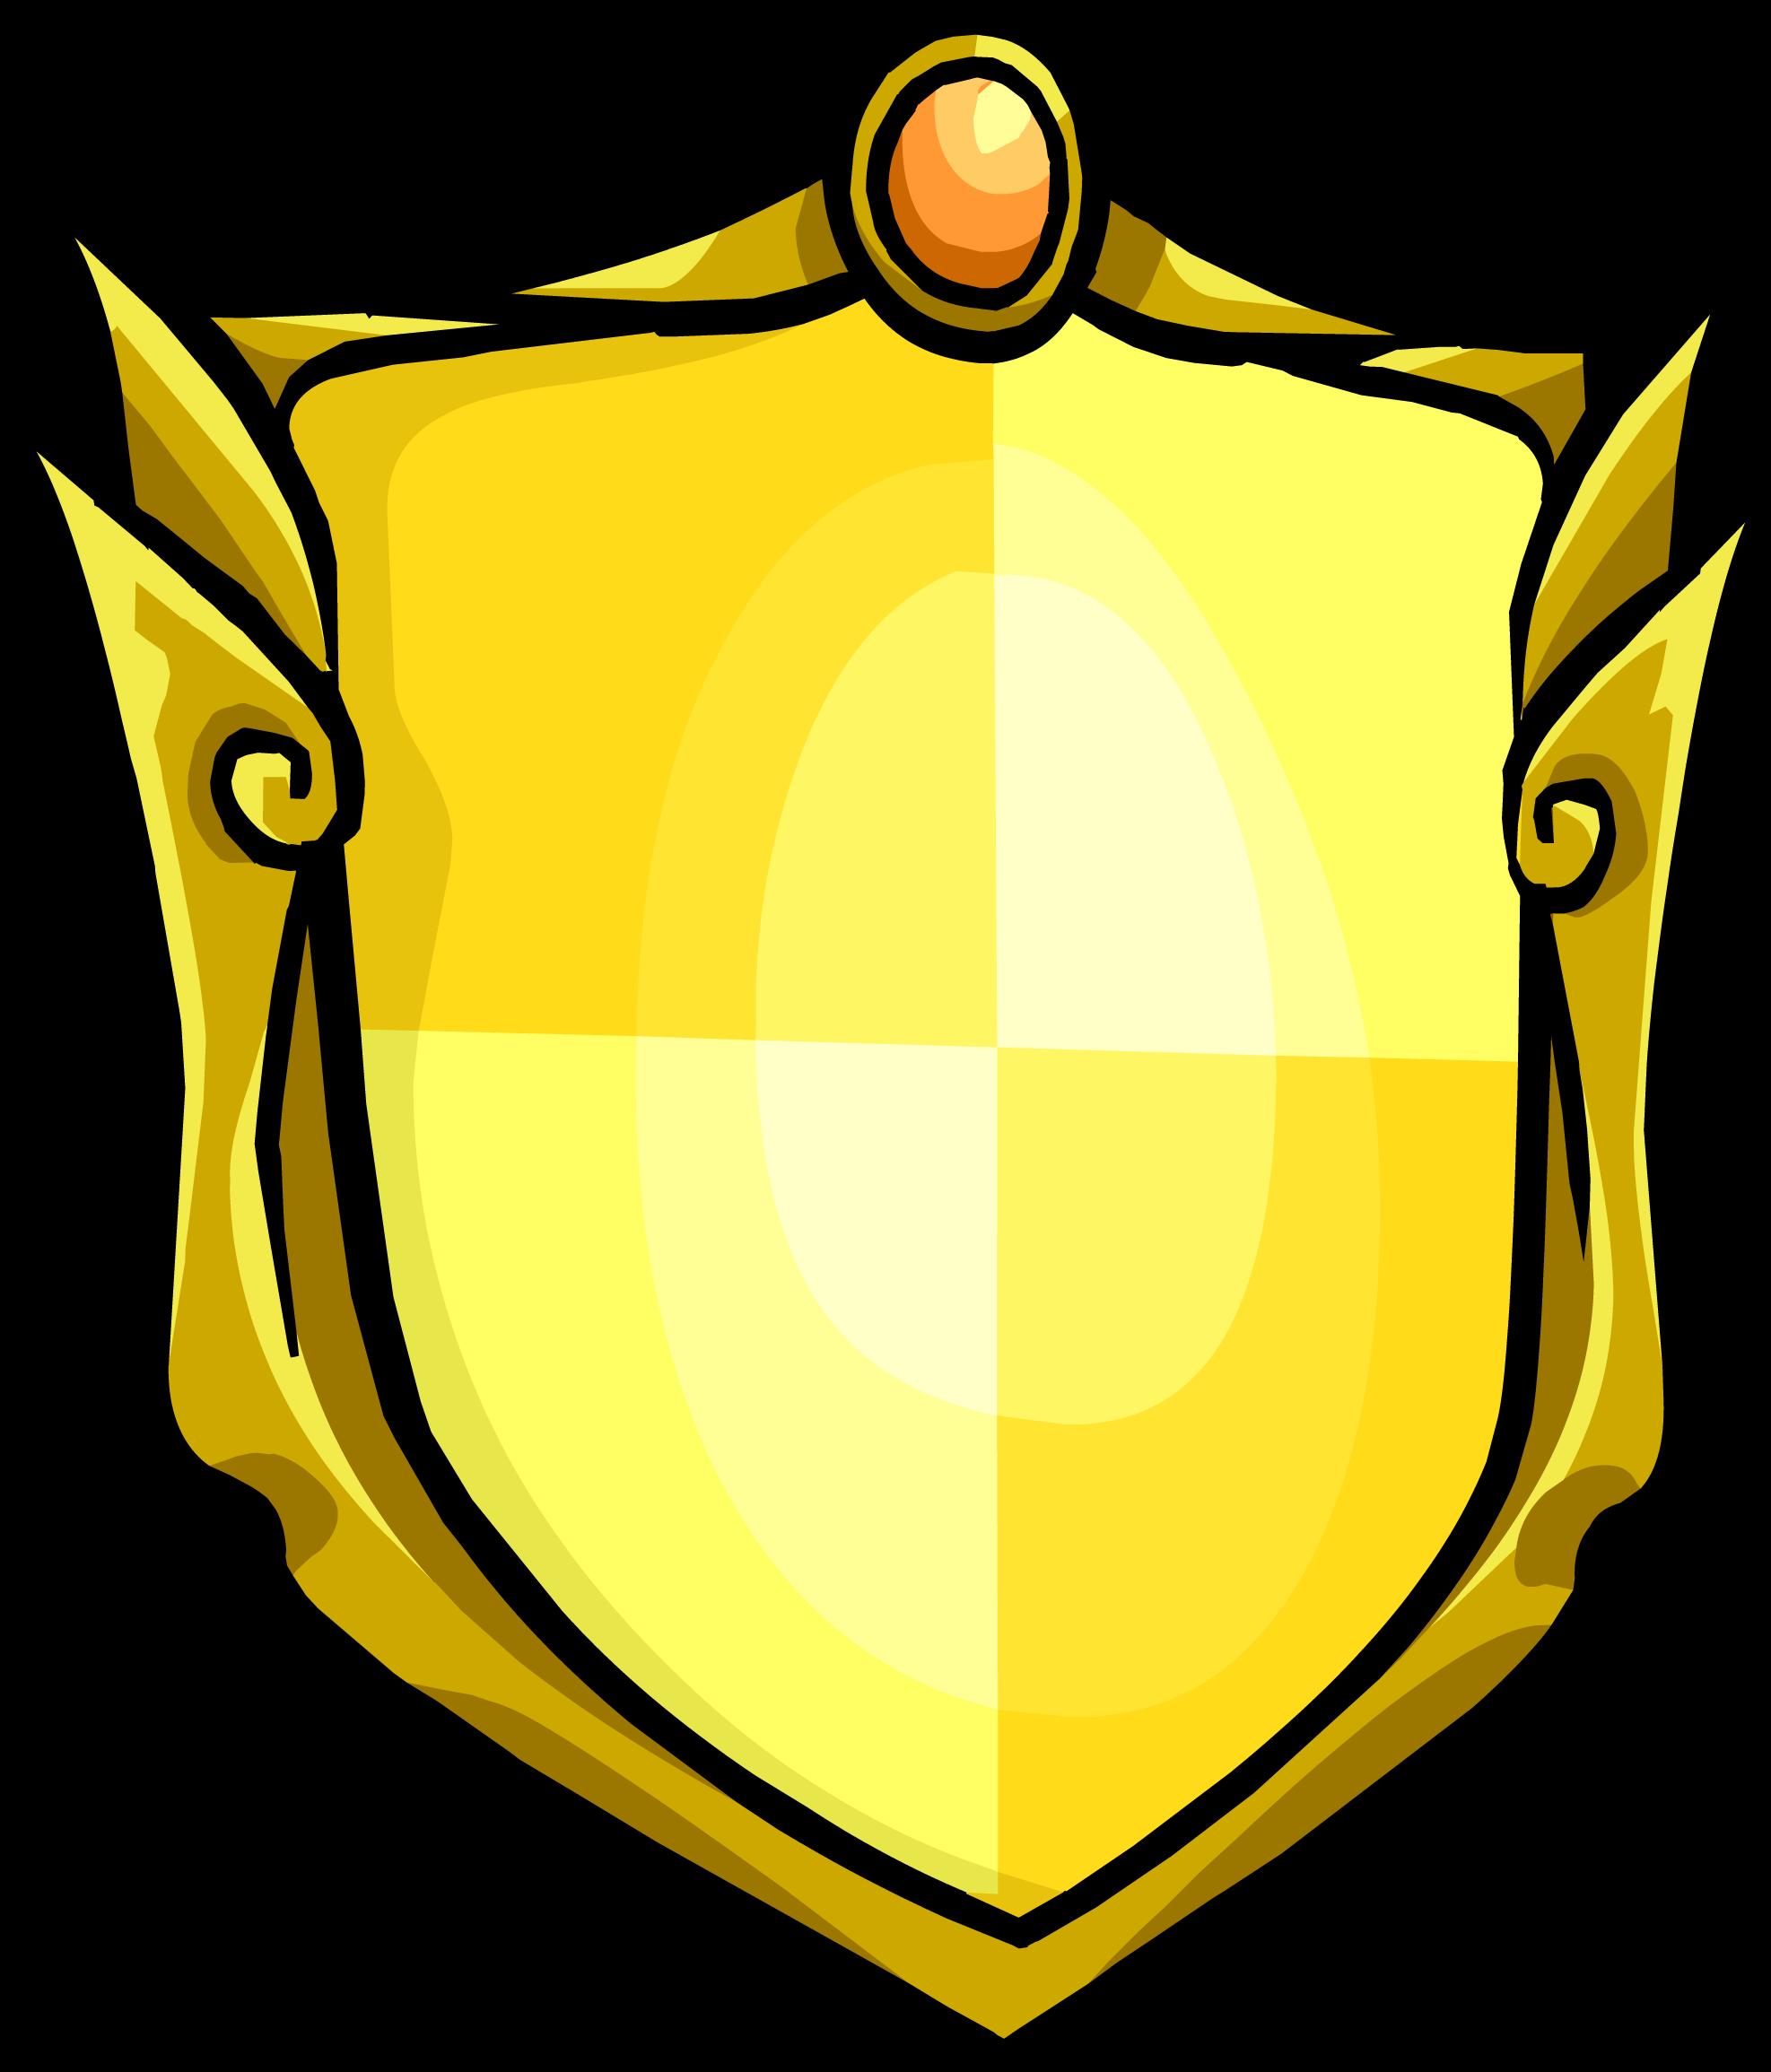 Knights clipart sheild. Golden shield club penguin